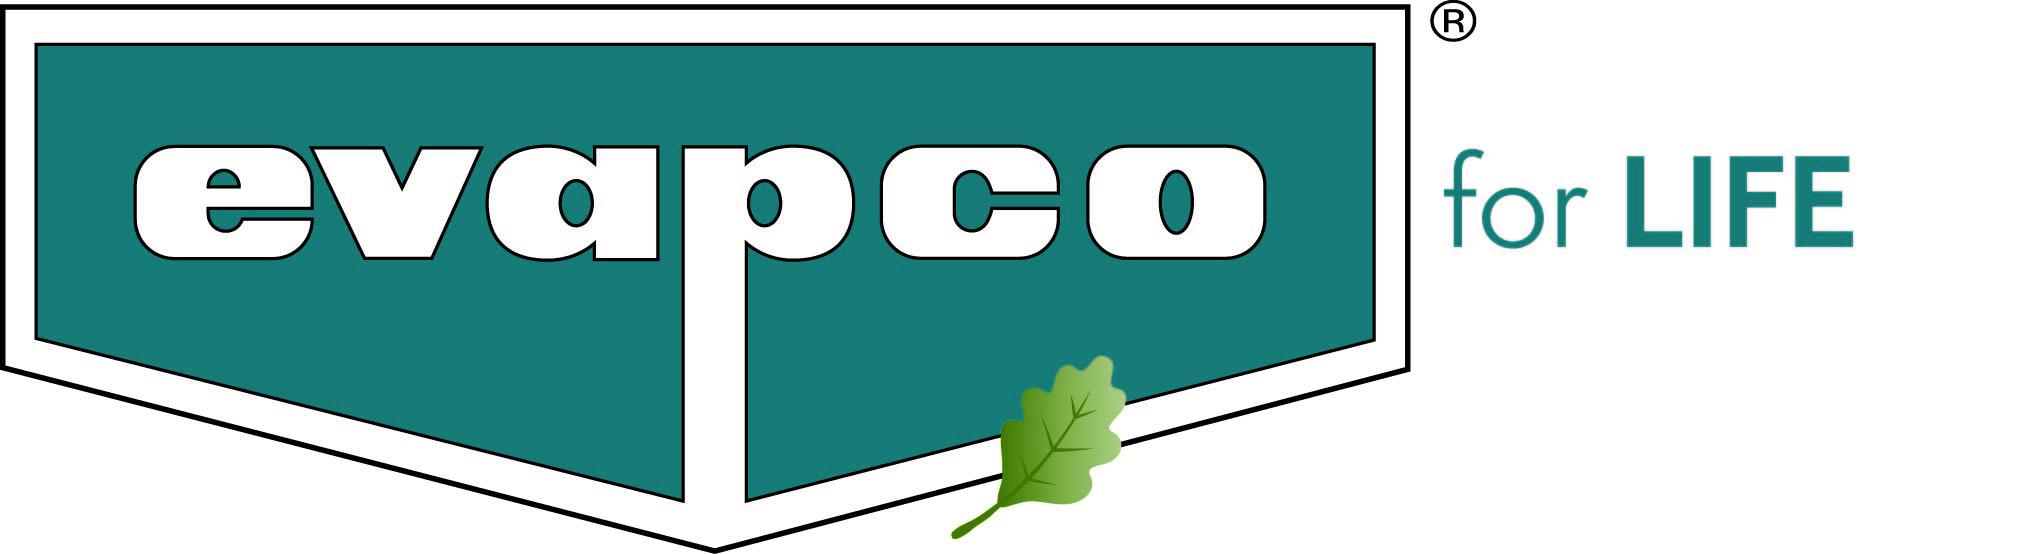 Evapco_forLIFE_ColorCorrected.jpg